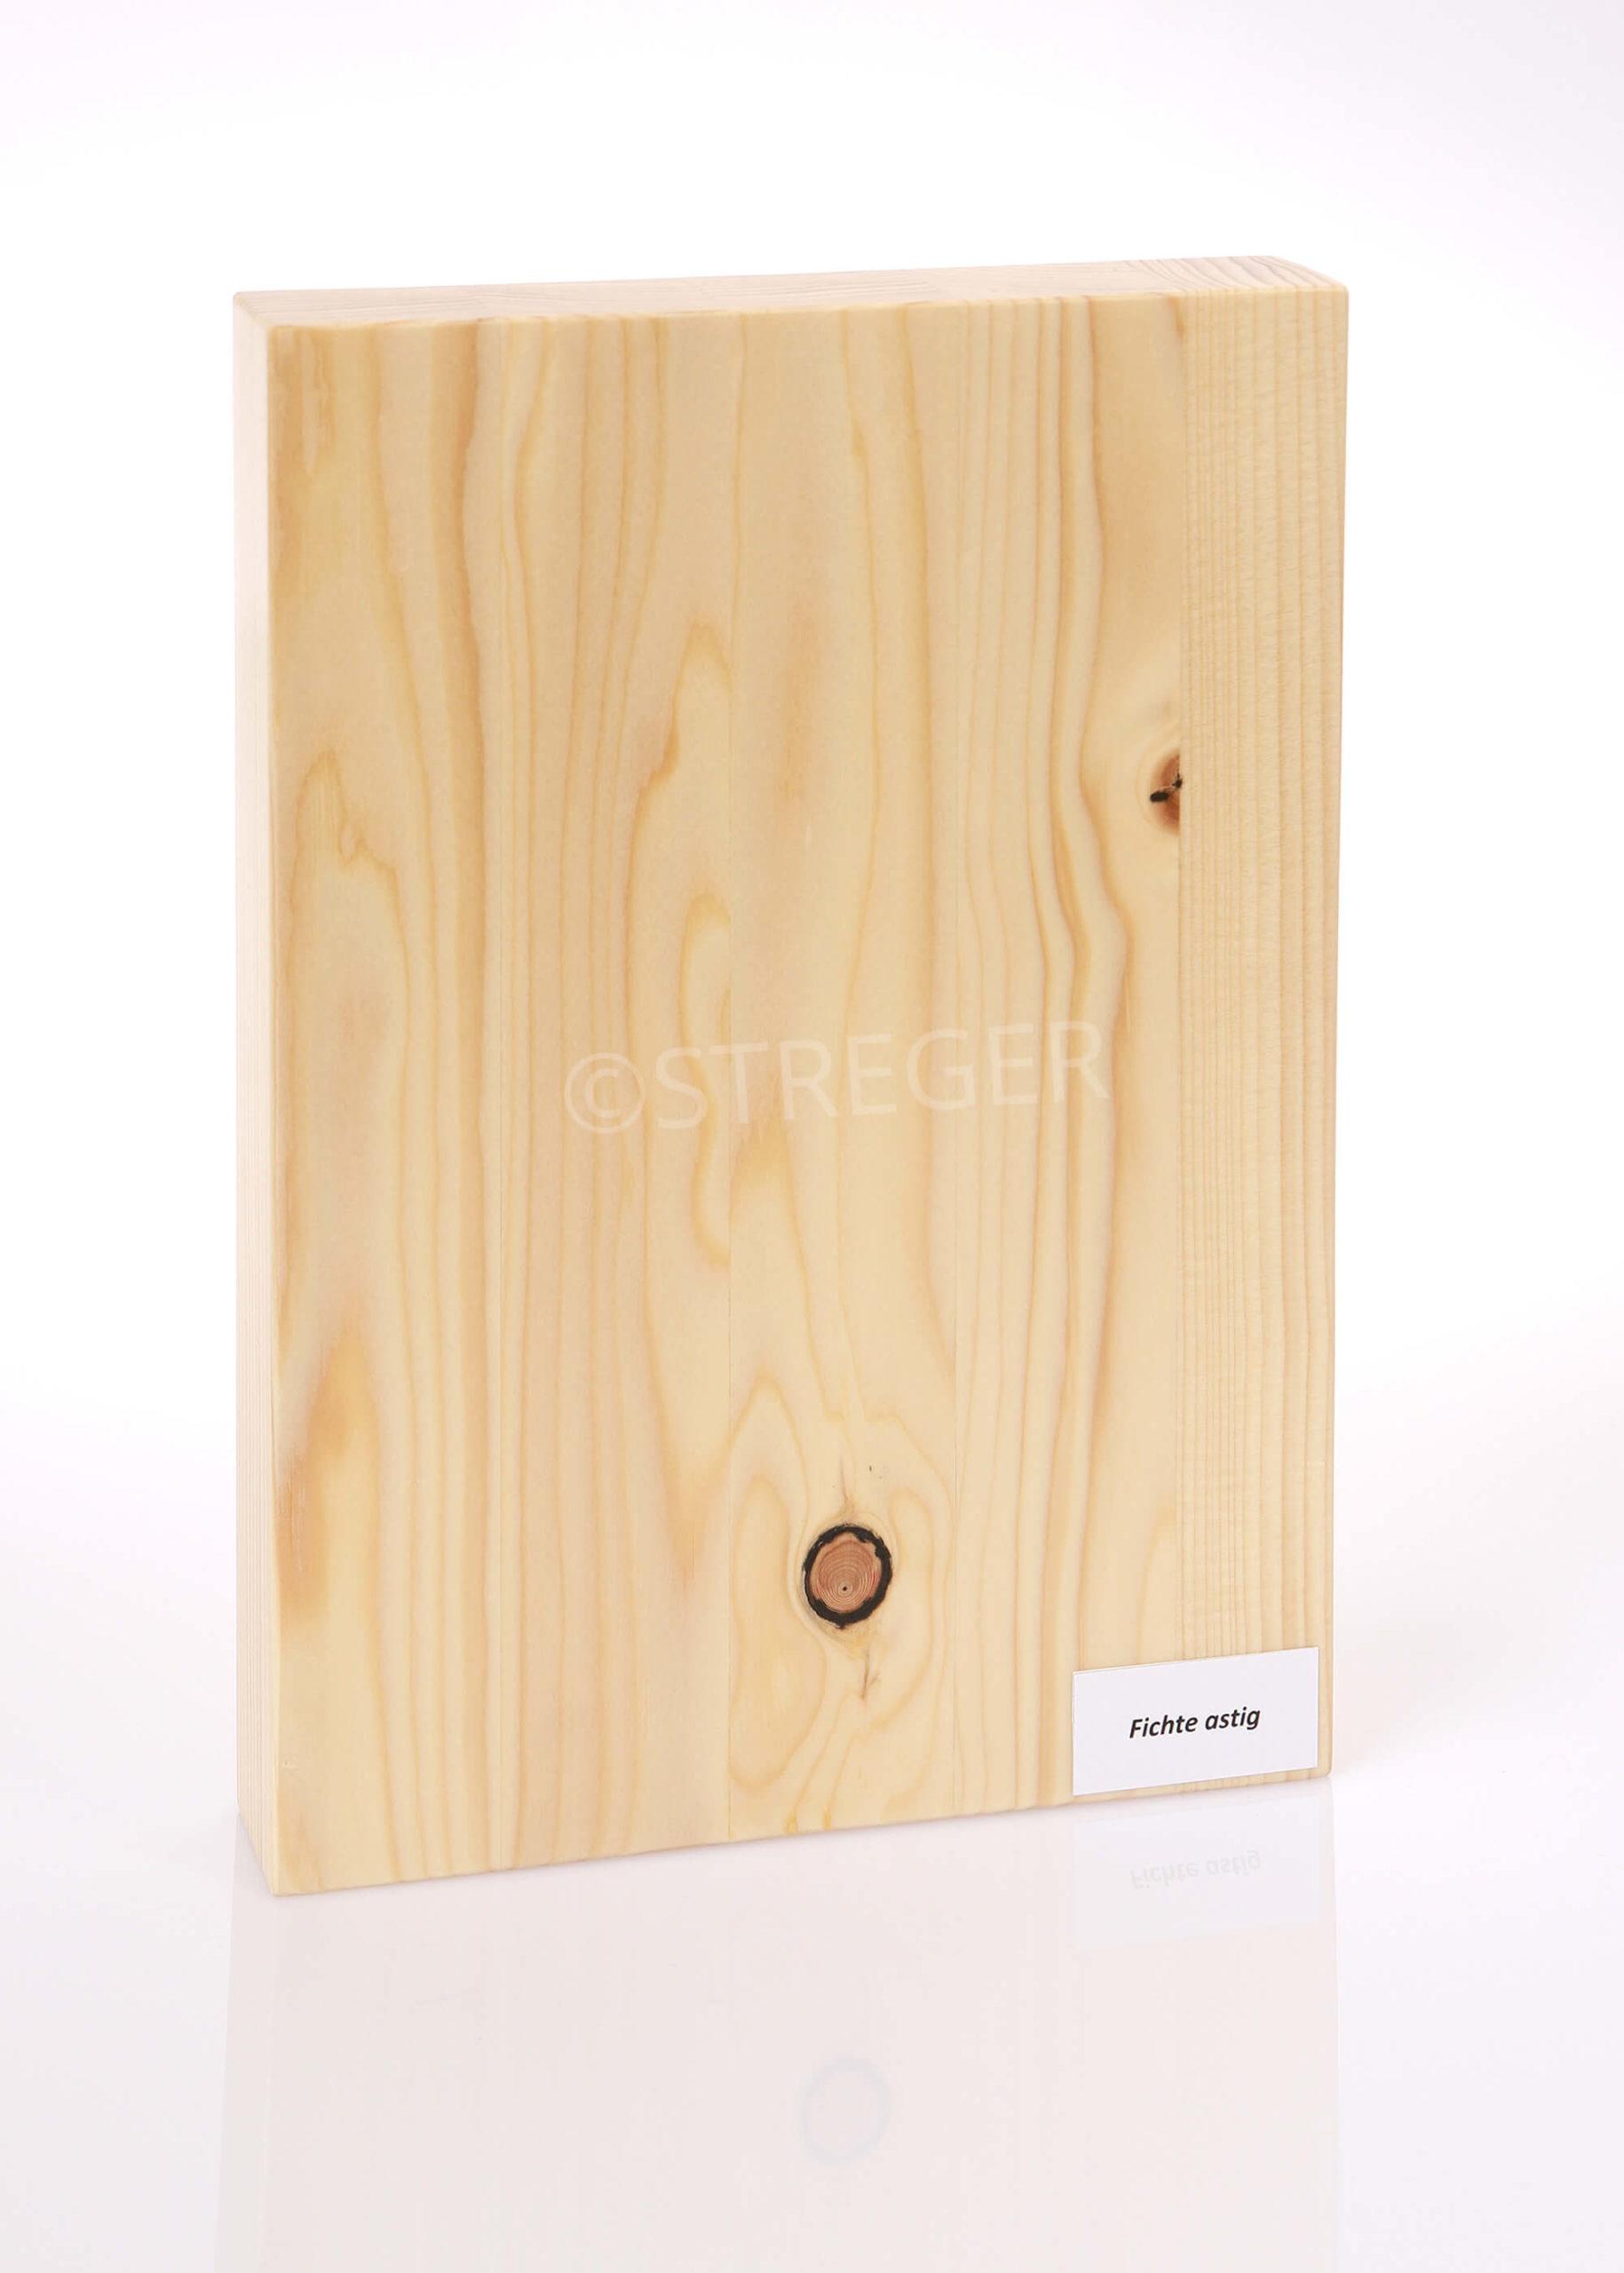 STREGER-Massivholztreppen-Fichte-astig